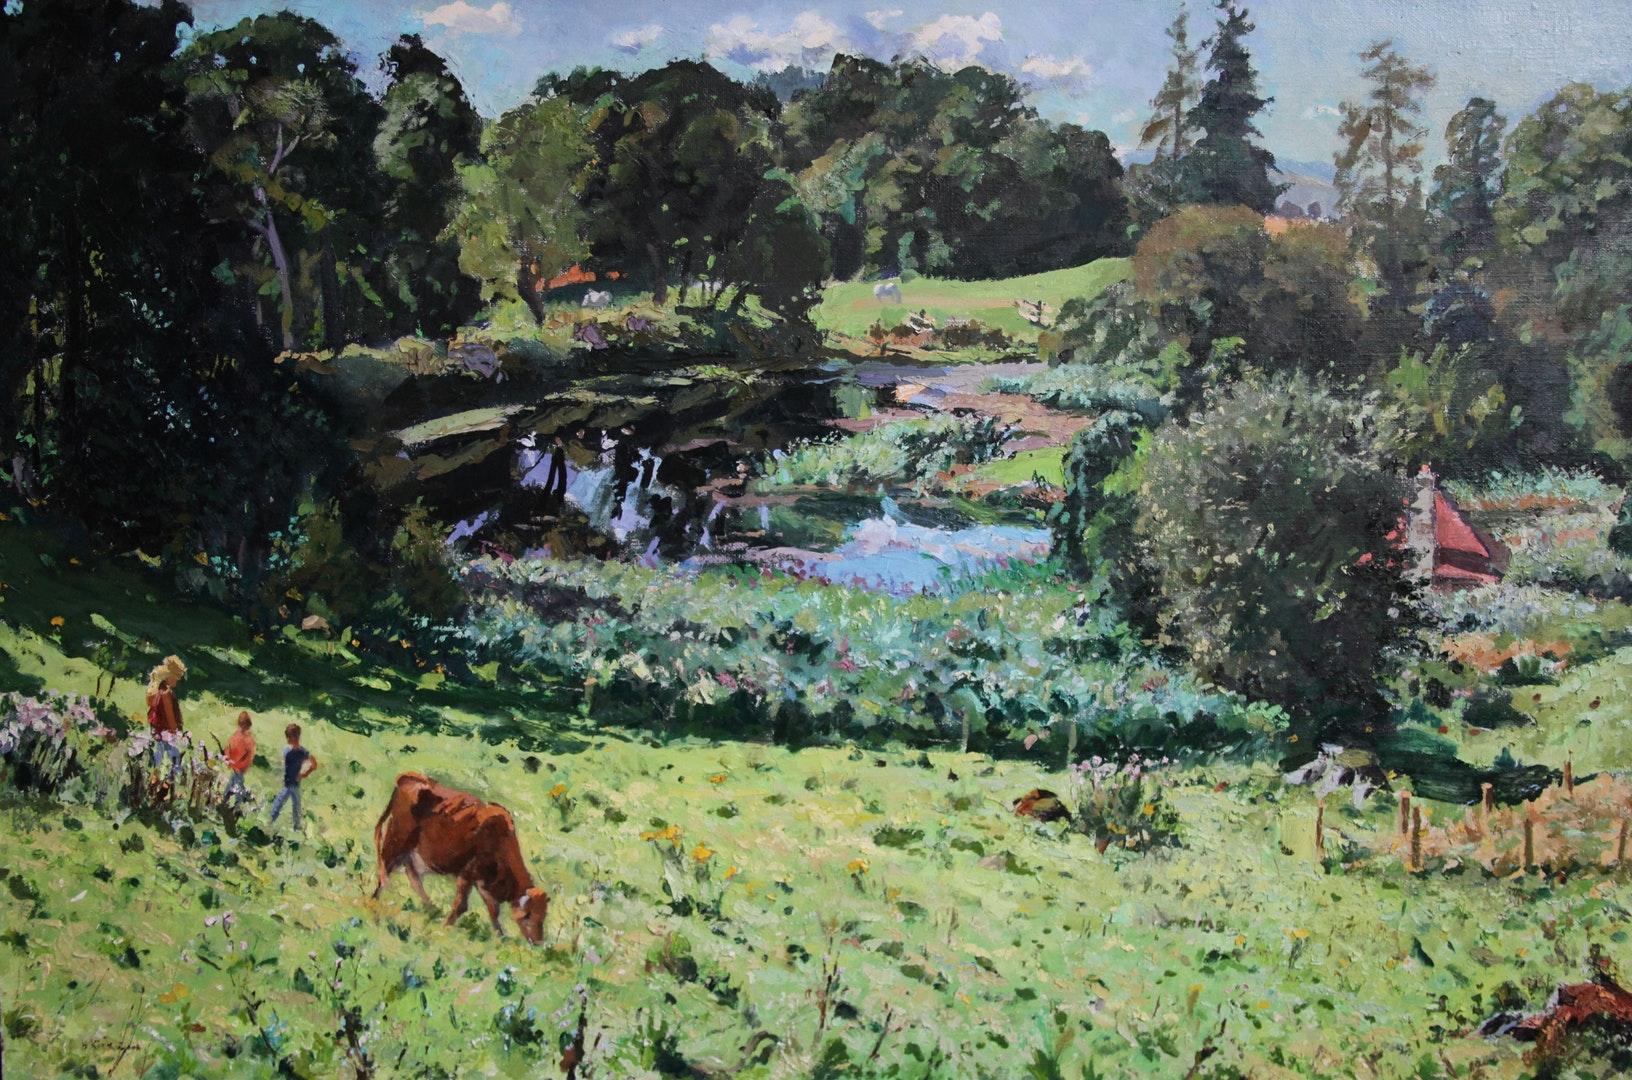 'High Summer', Hugh Kirkwood, Oil on canvas, 101 x 153 cm